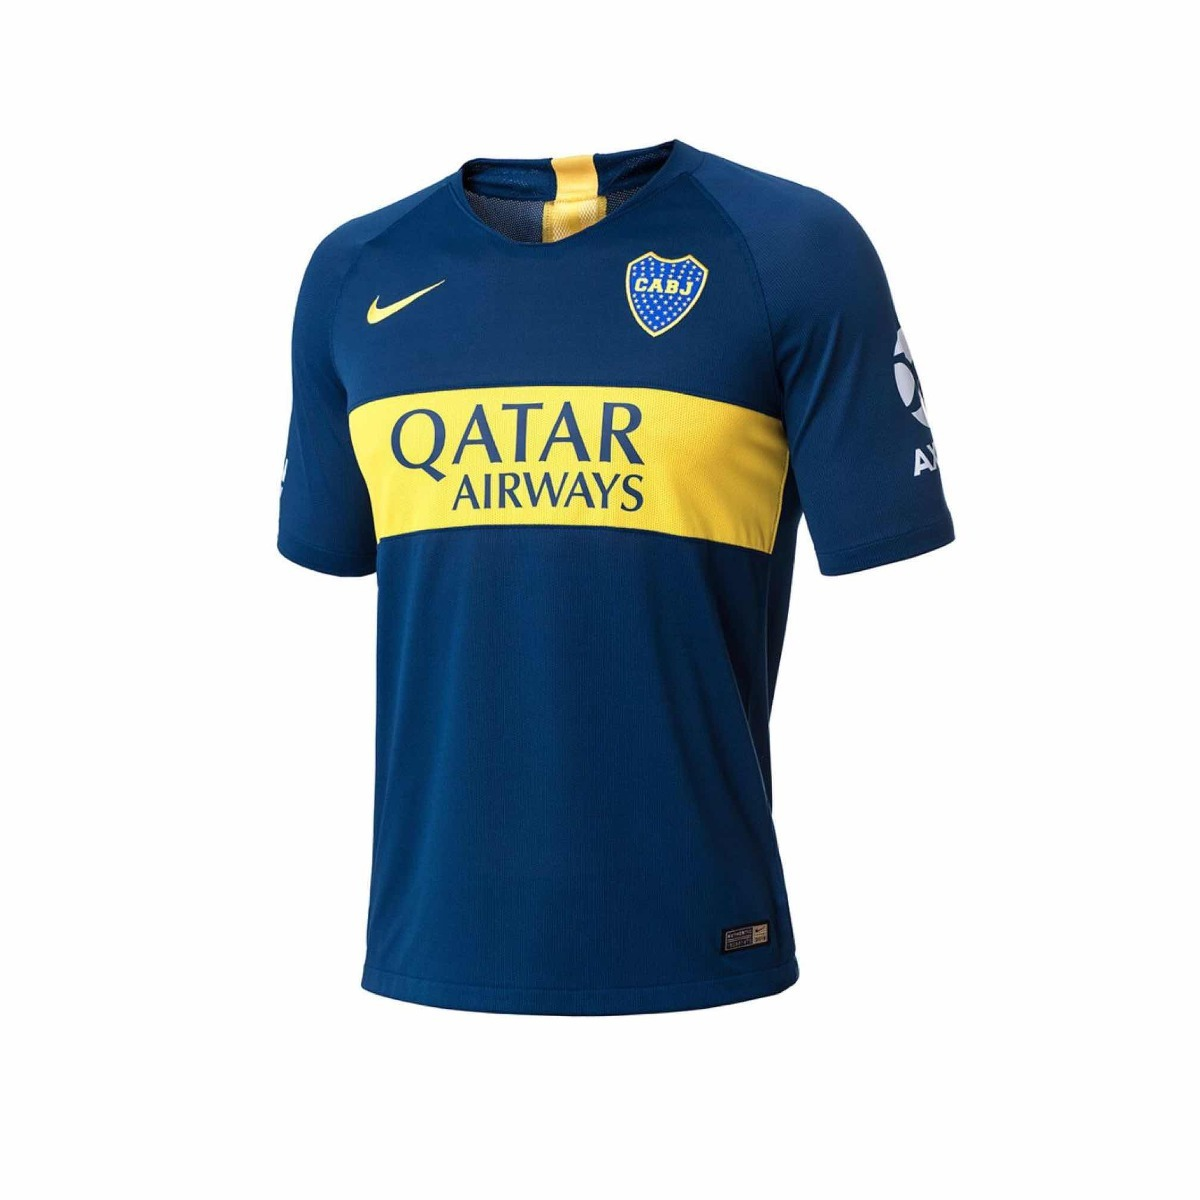 42e6570de507a camiseta oficial boca juniors titular qatar 2019 - recoleta. Cargando zoom.